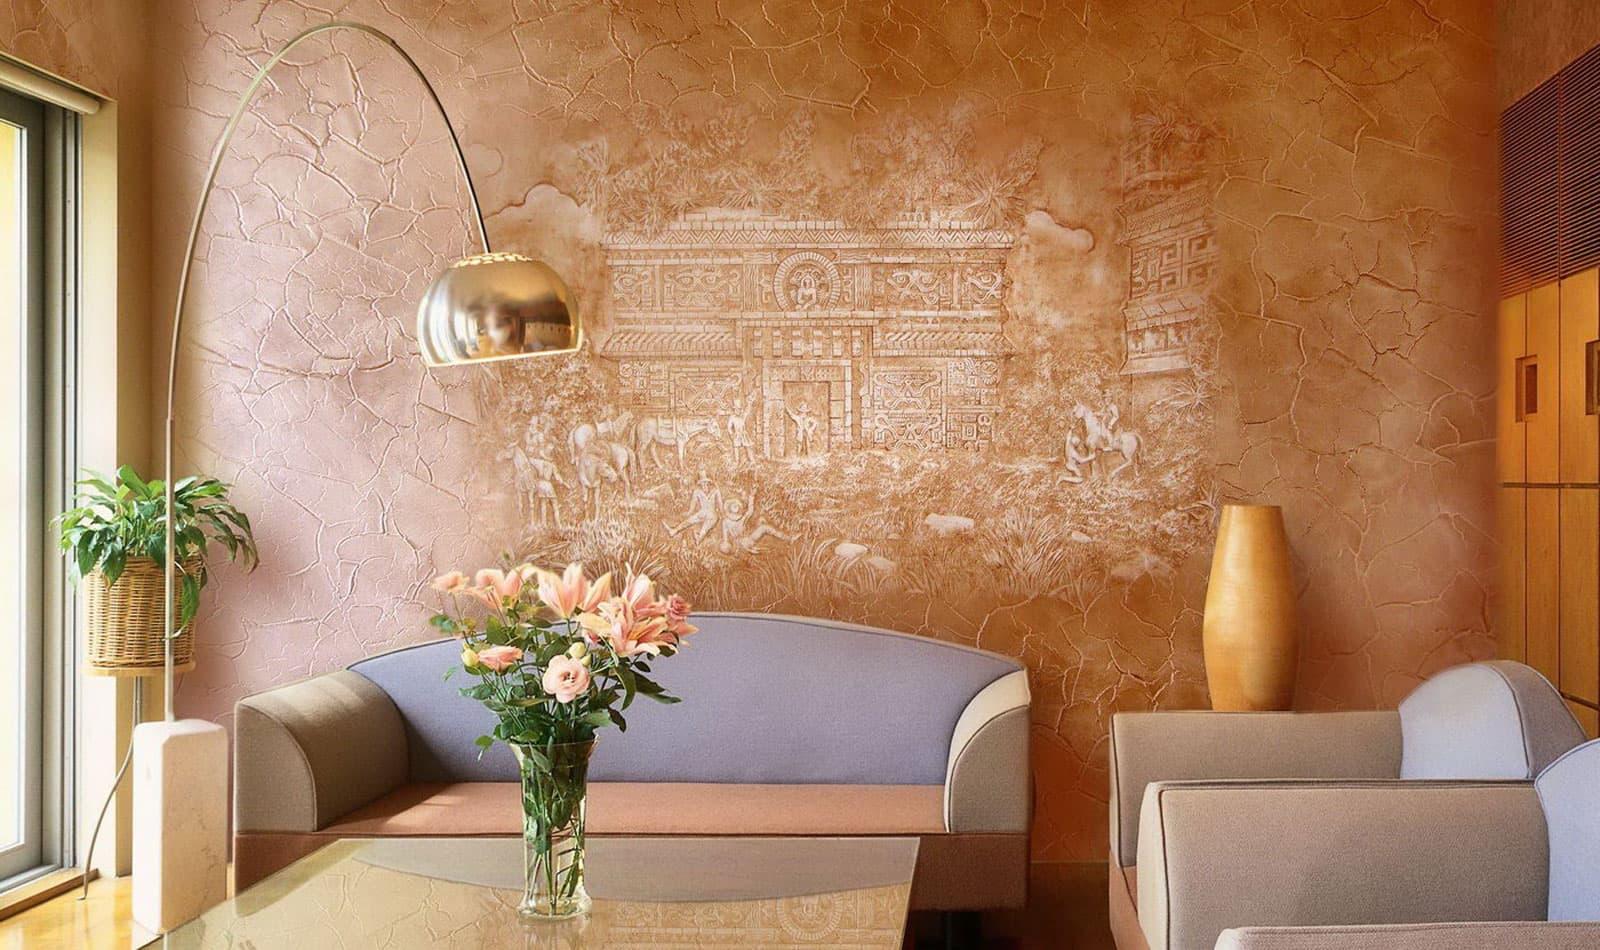 местном доме декор стен жидкими обоями фото вид